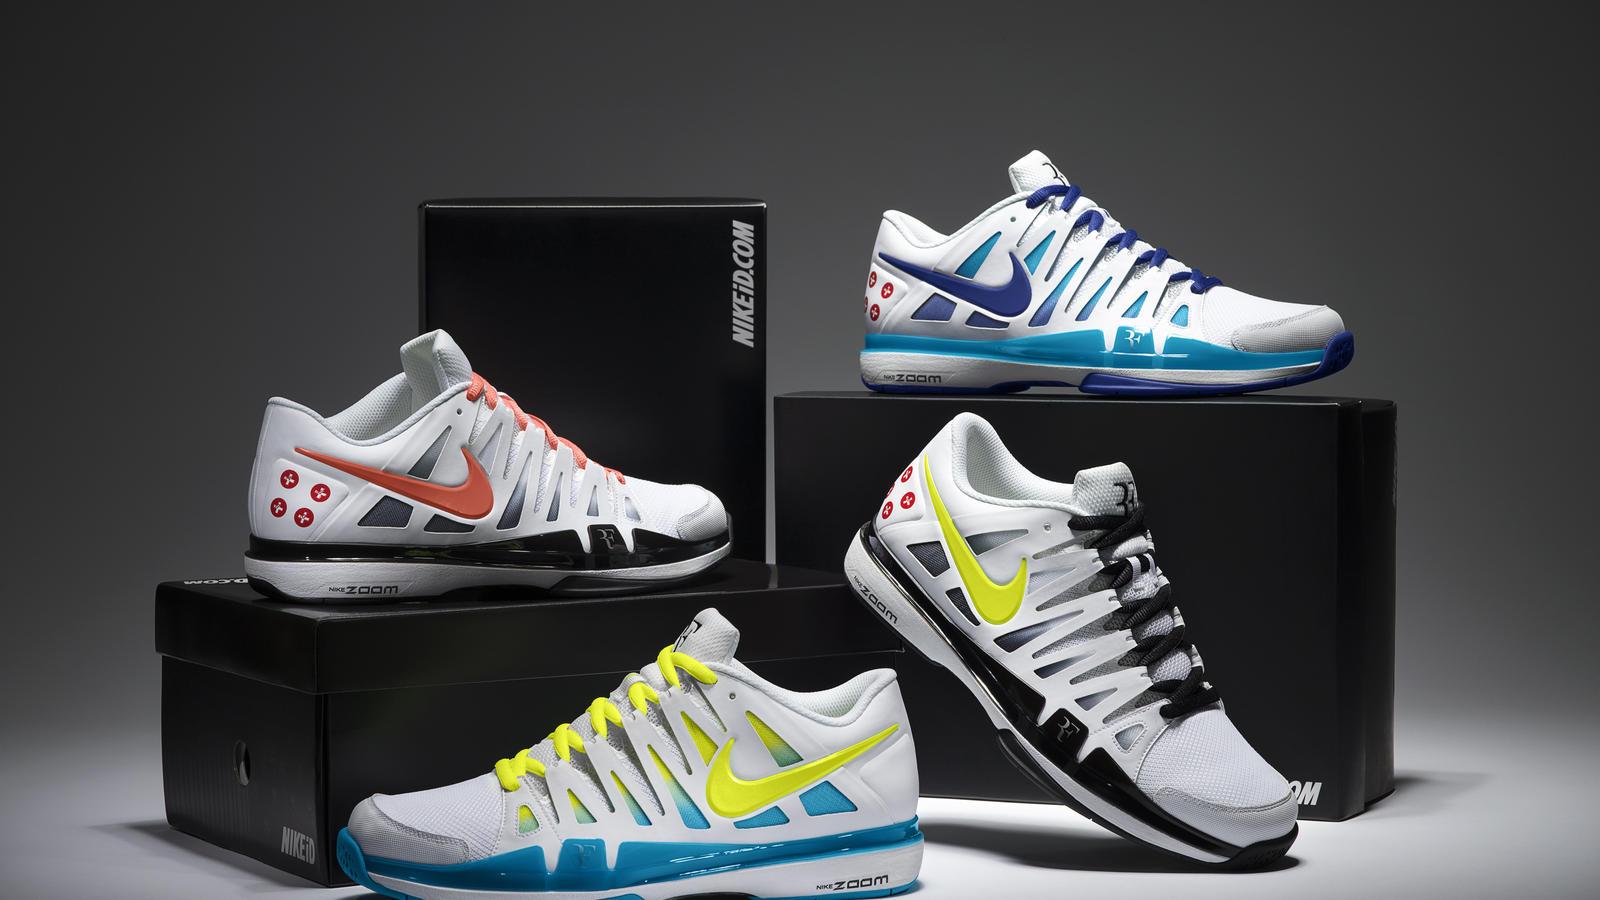 News Slam Shoes To Fans Roger Grand Invites Choose Federer Nike SVzMUp